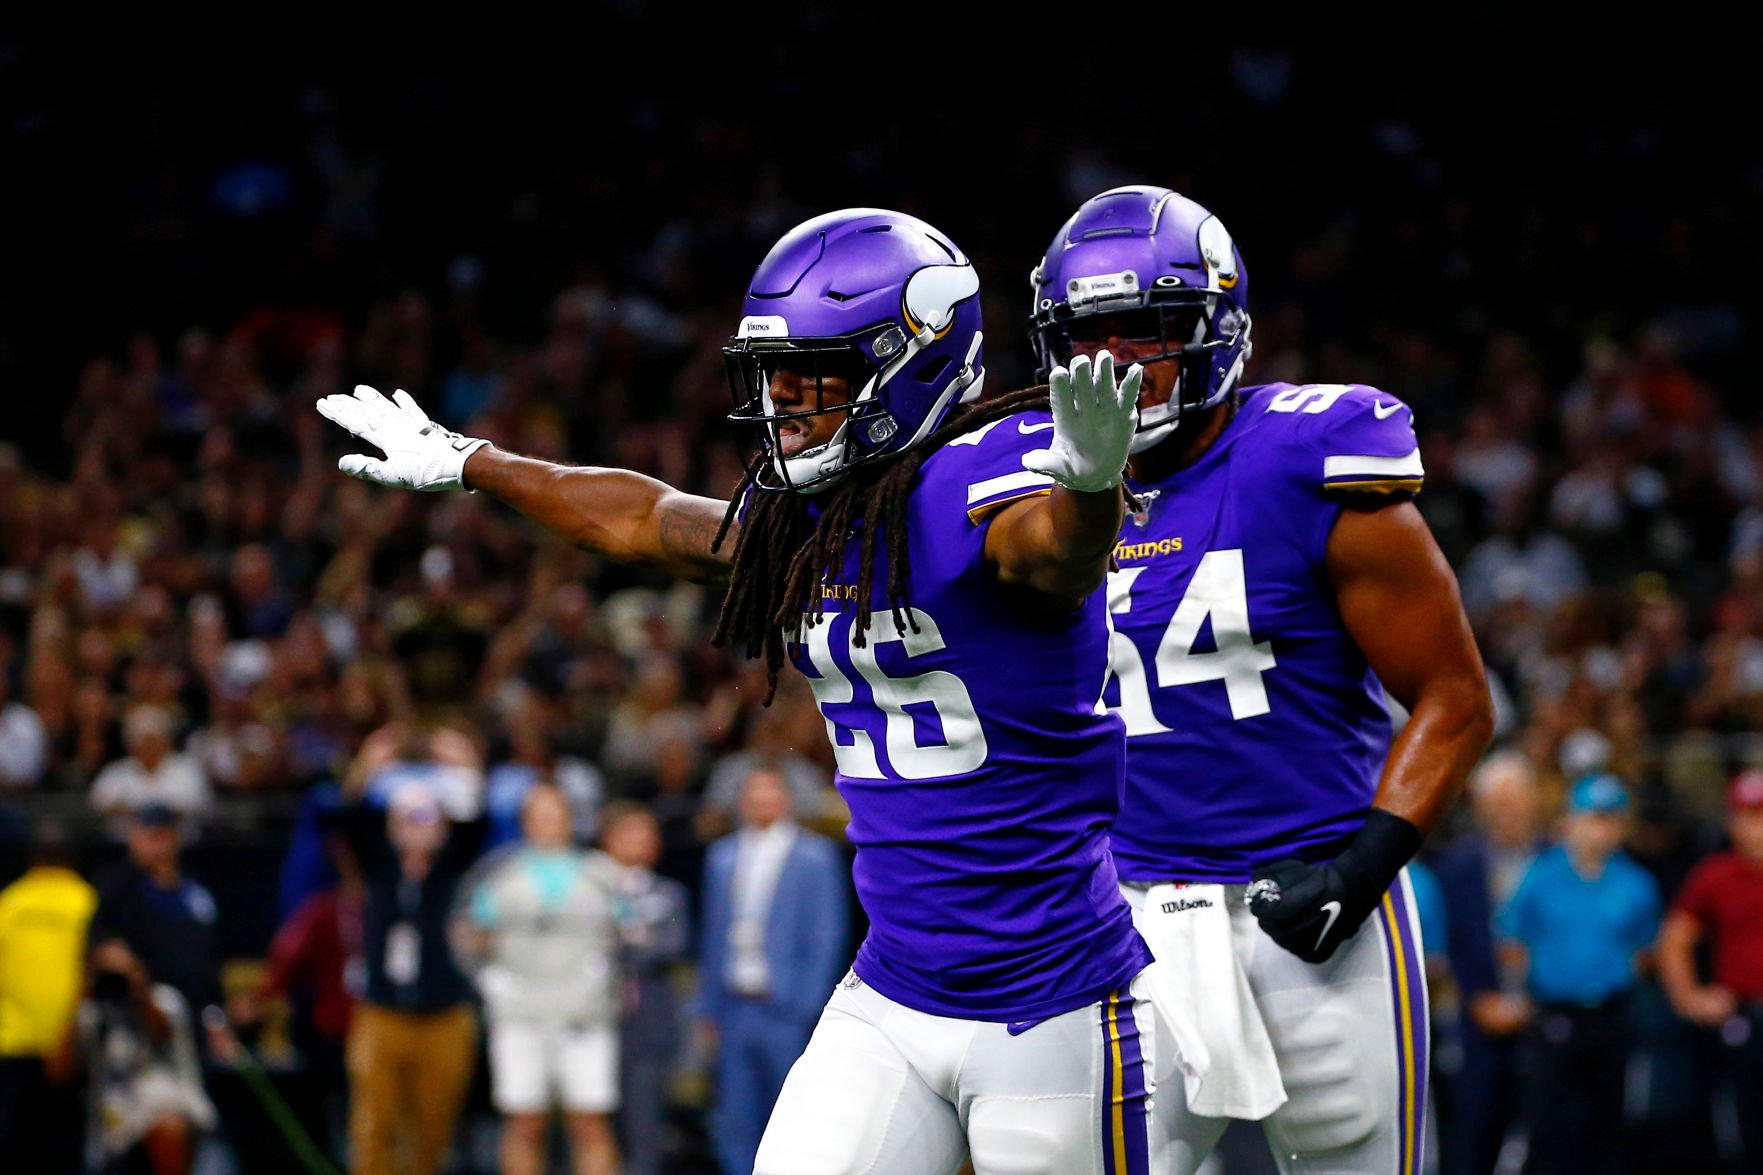 NFL: Kenosha native Trae Waynes speaks out | Sports | kenoshanews.com